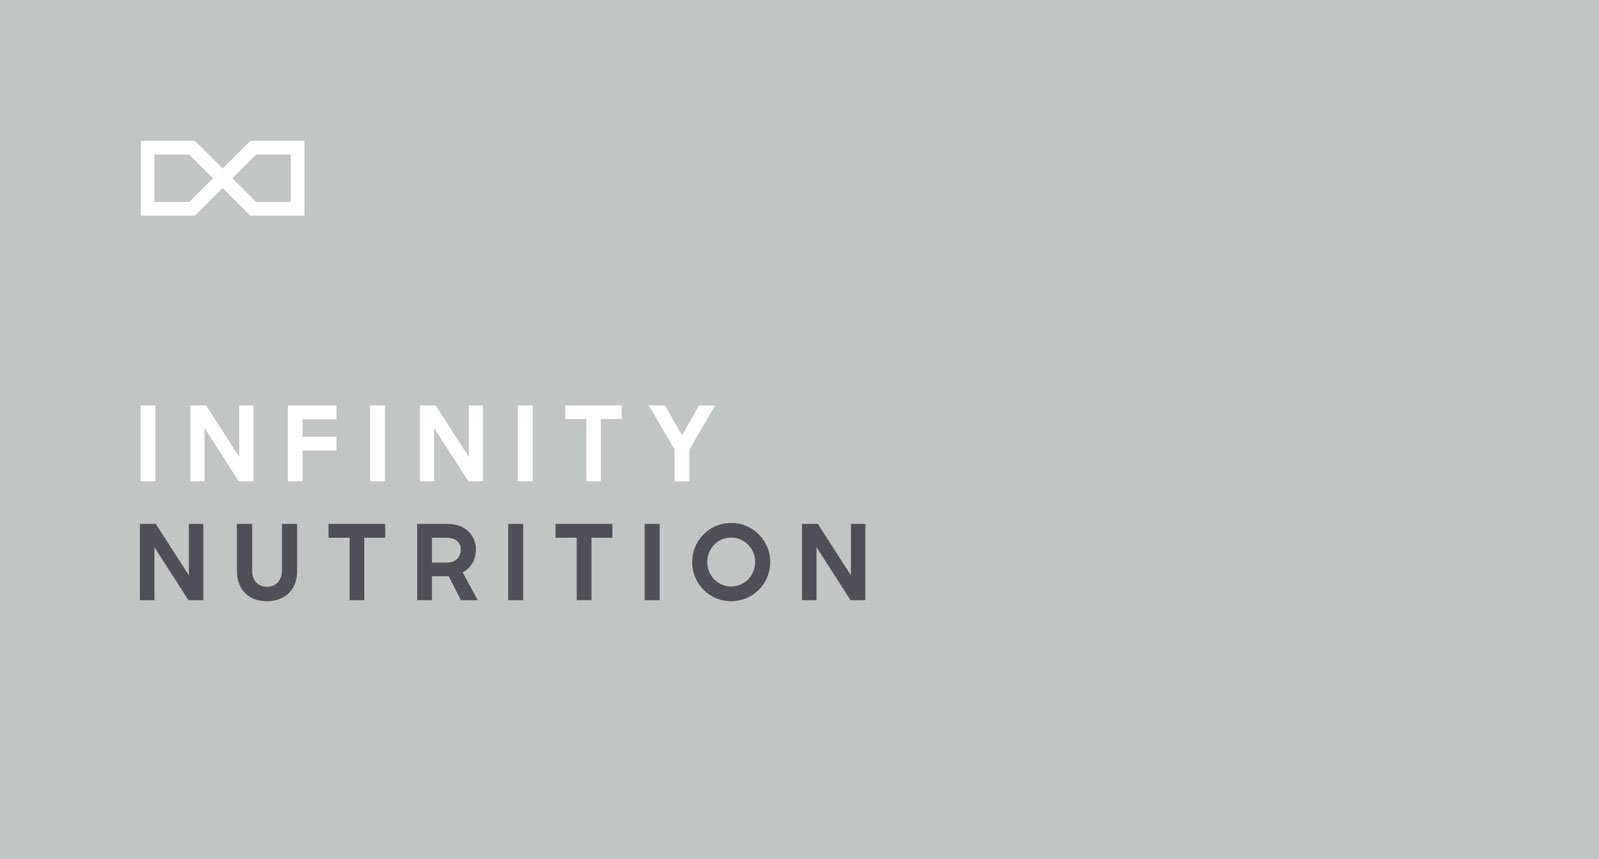 INFINITY_NUTRITION__LOGO.jpg